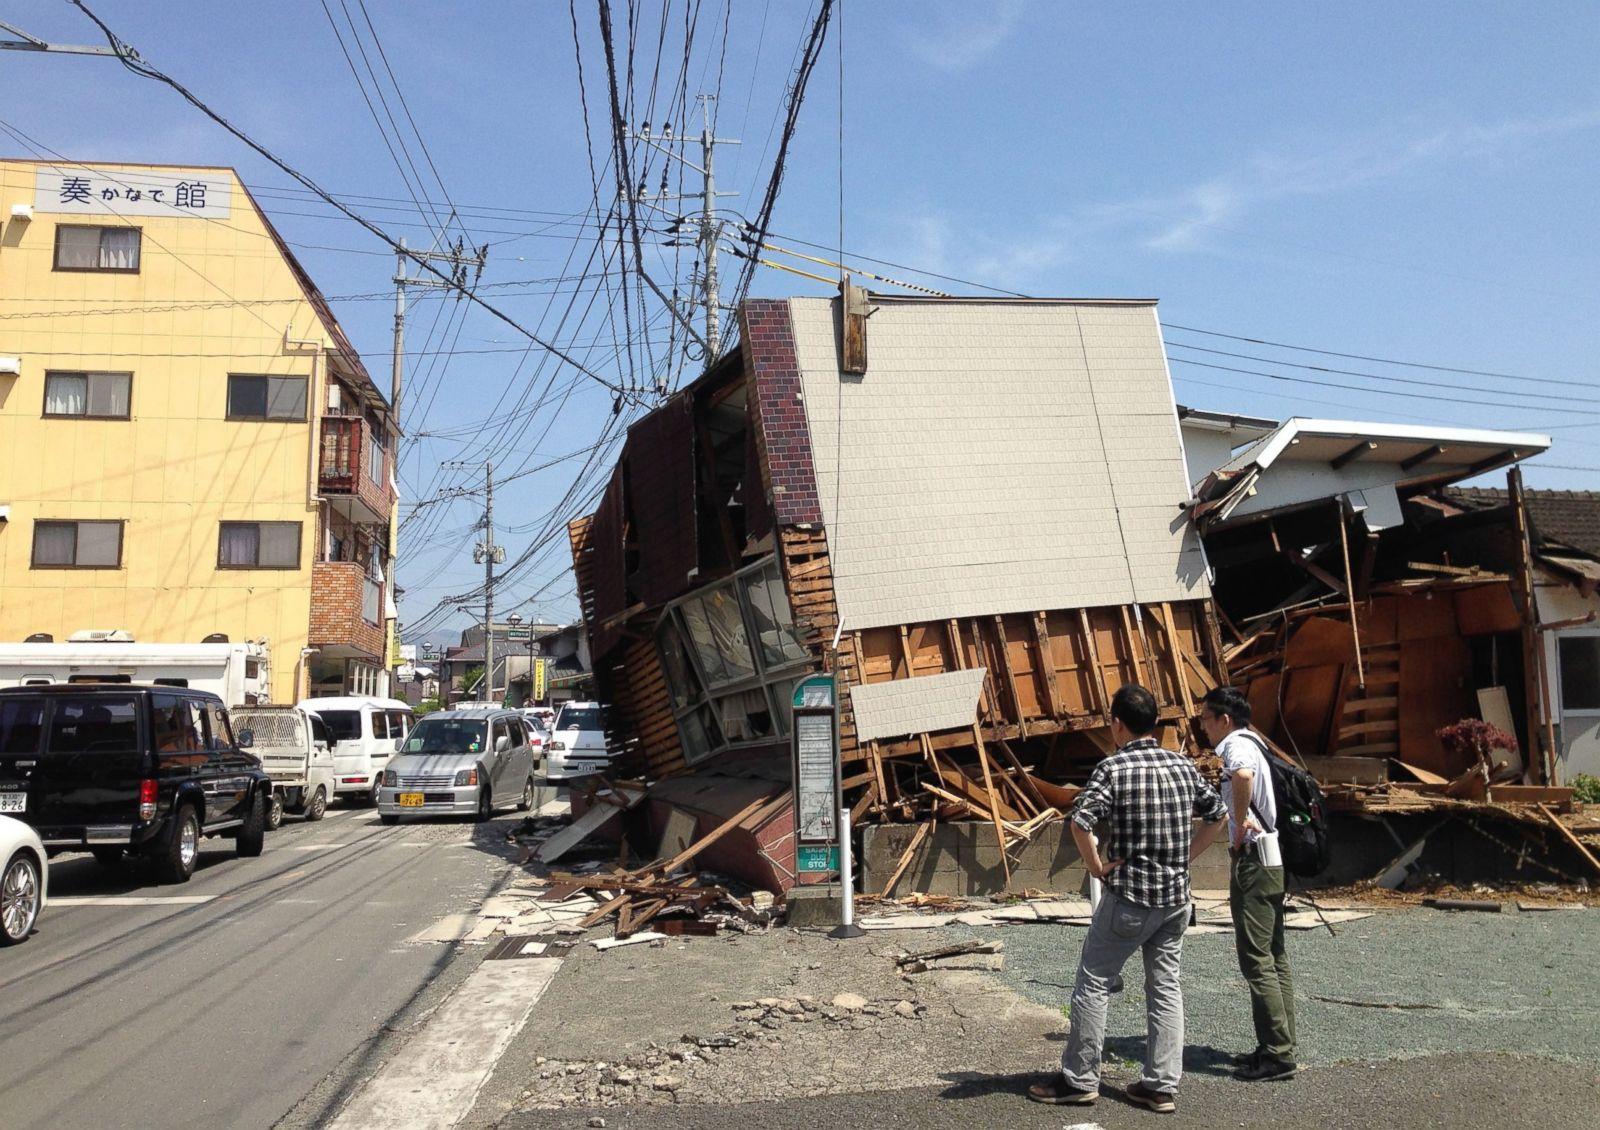 environ 27.22 kg Sakuma clair Shook leader 60 lb //100 M MADE IN JAPAN